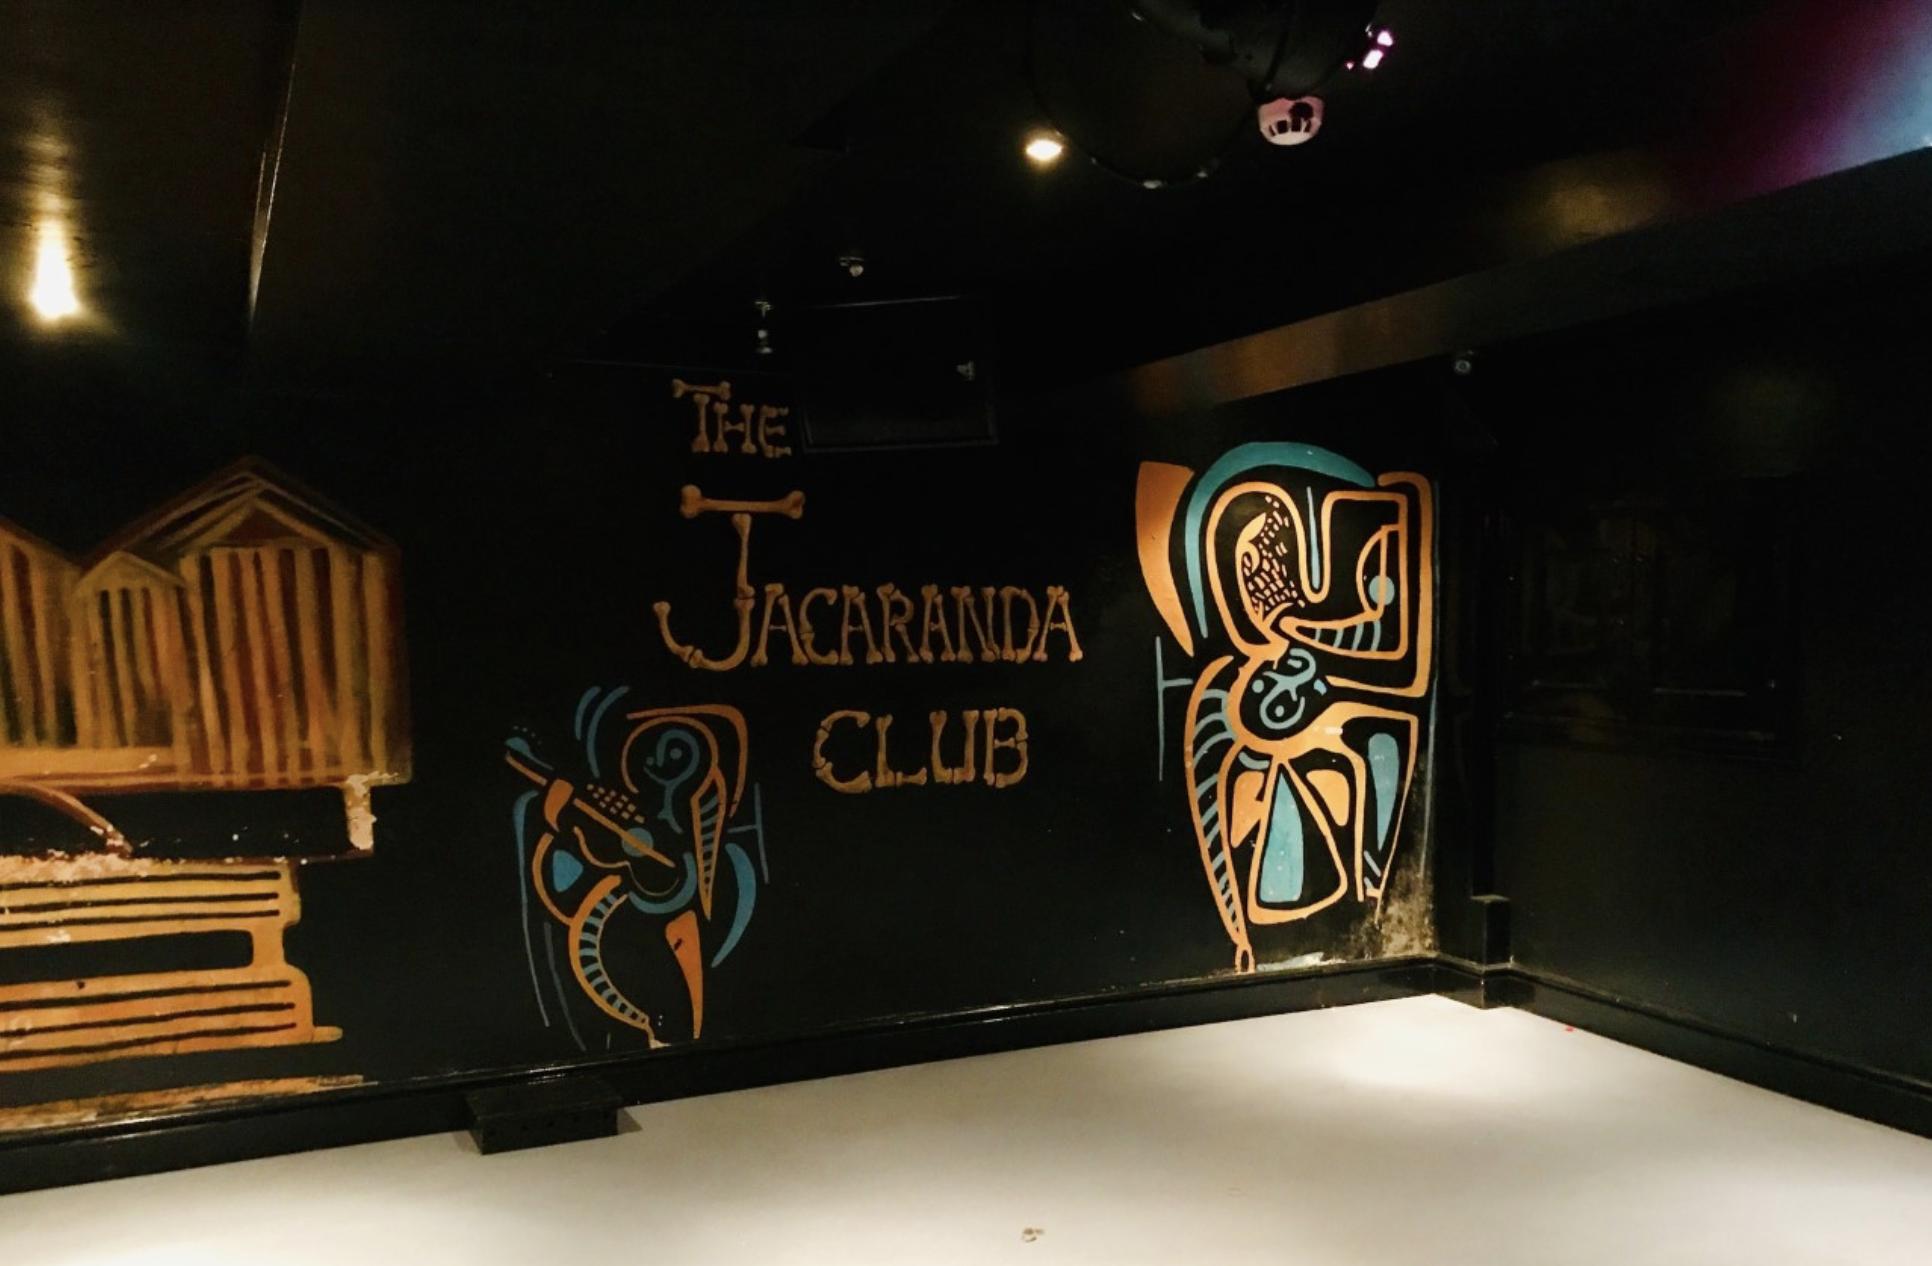 The Jacaranda Club